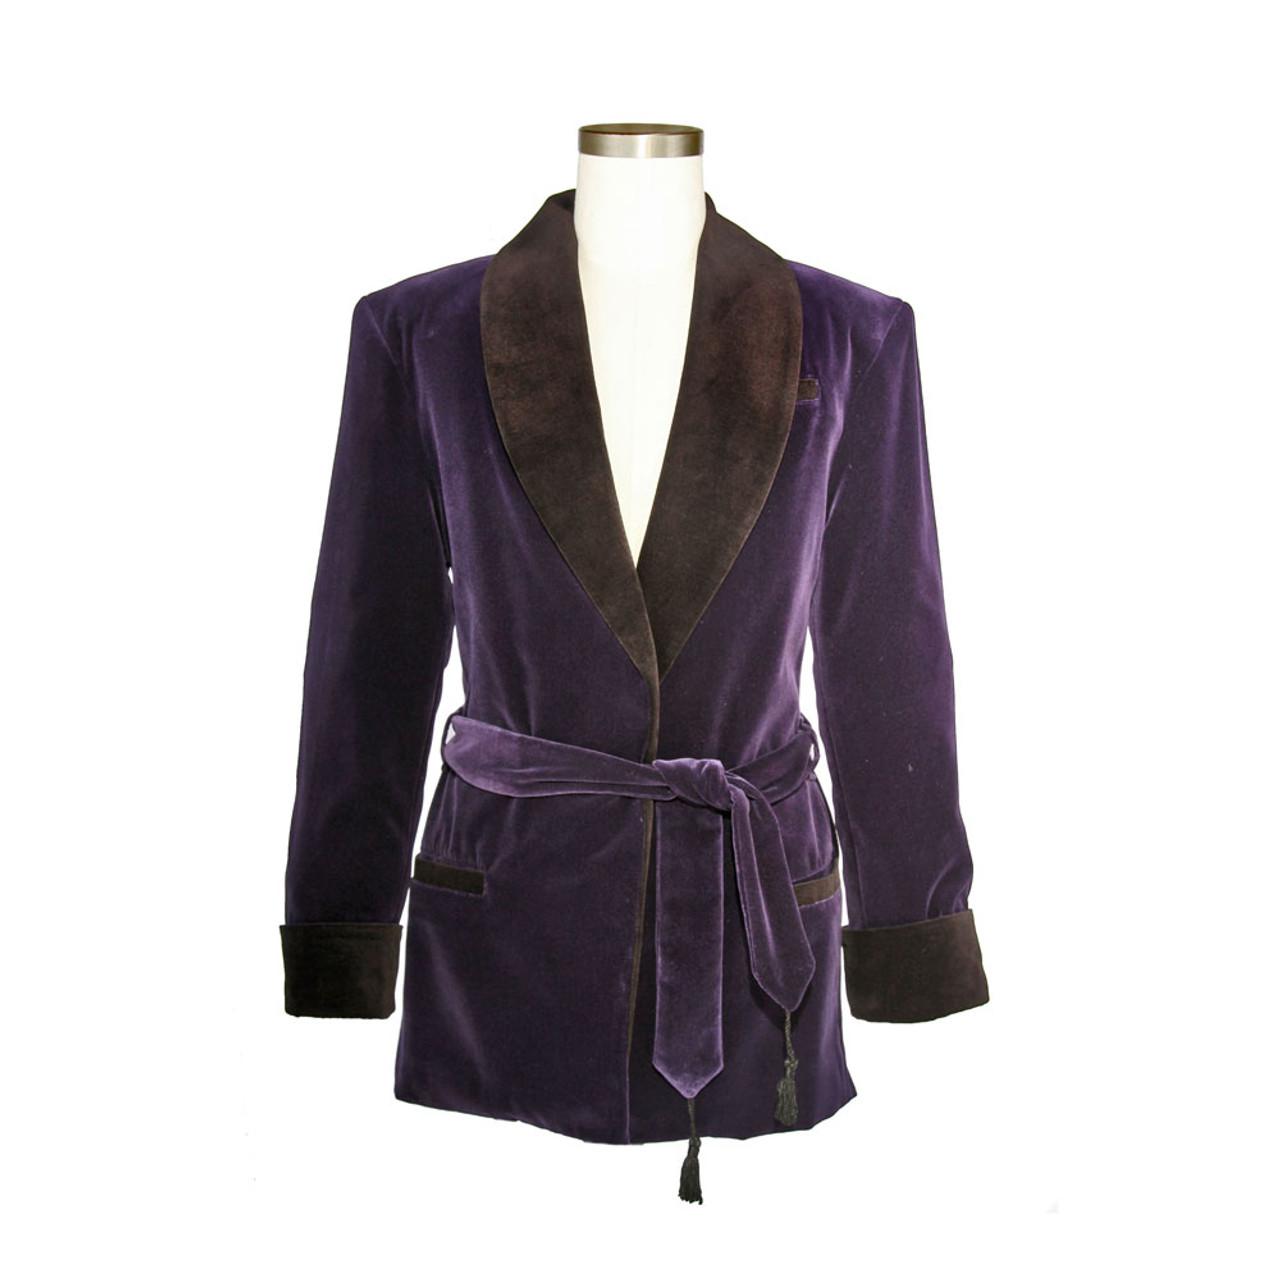 Women s Bilberry Purple Velvet Smoking Jacket with Black Lining e4fd1cf9b0